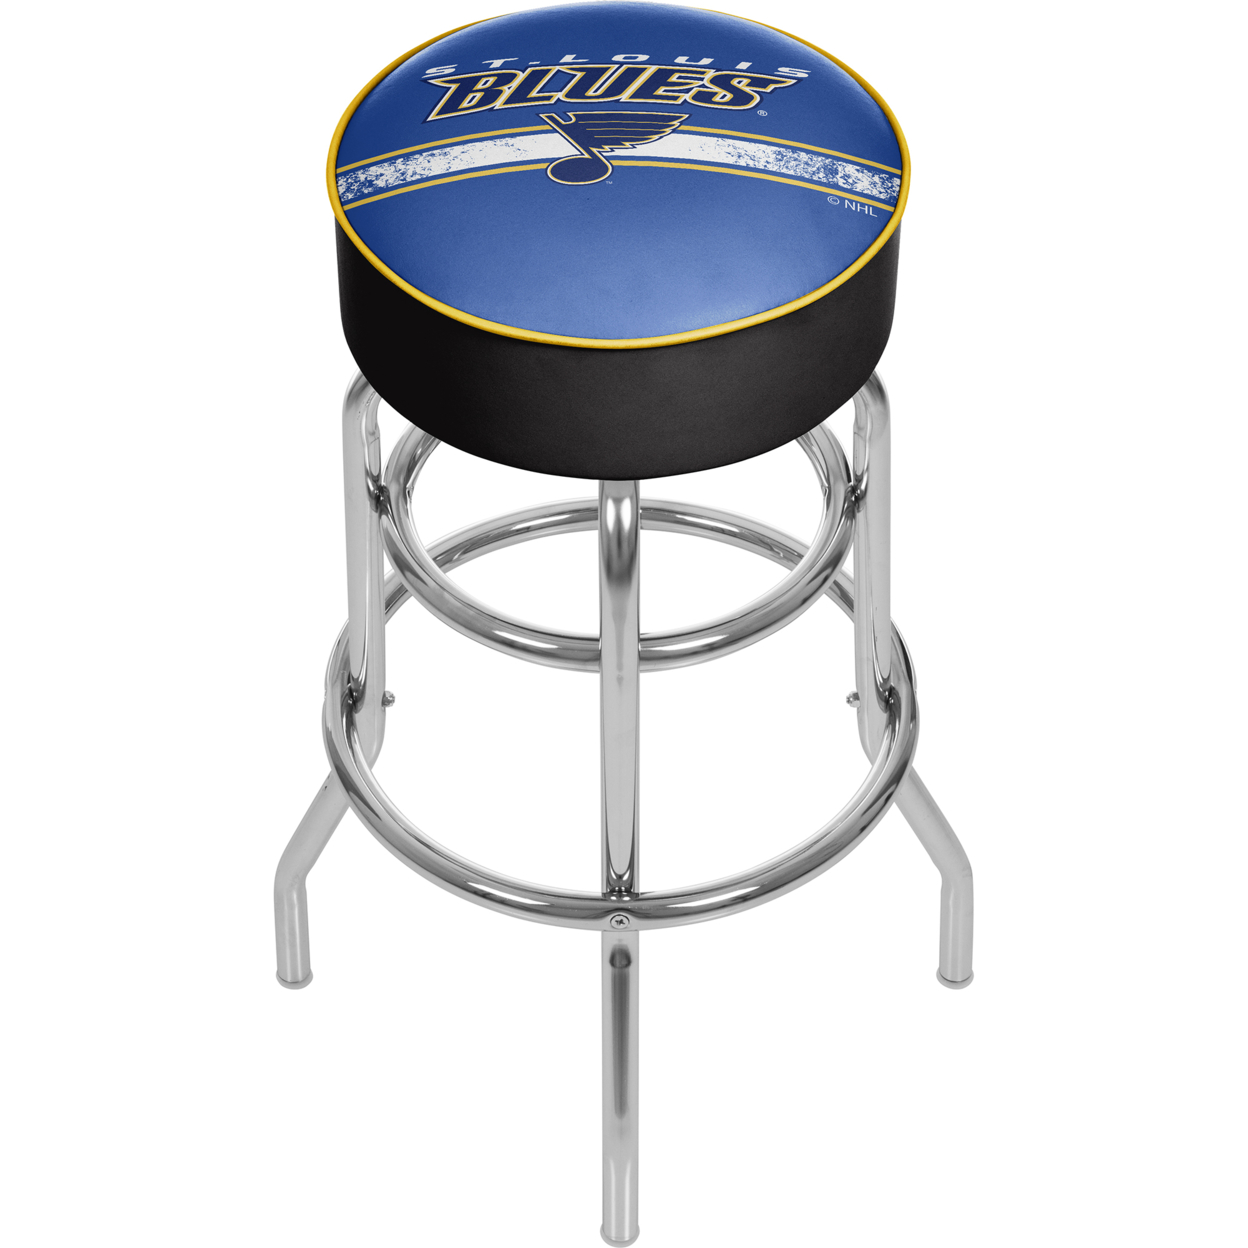 NHL Chrome 30 Inch Bar Stool with Swivel - St. Louis Blues nhl chrome 42 inch pub table columbus blue jackets